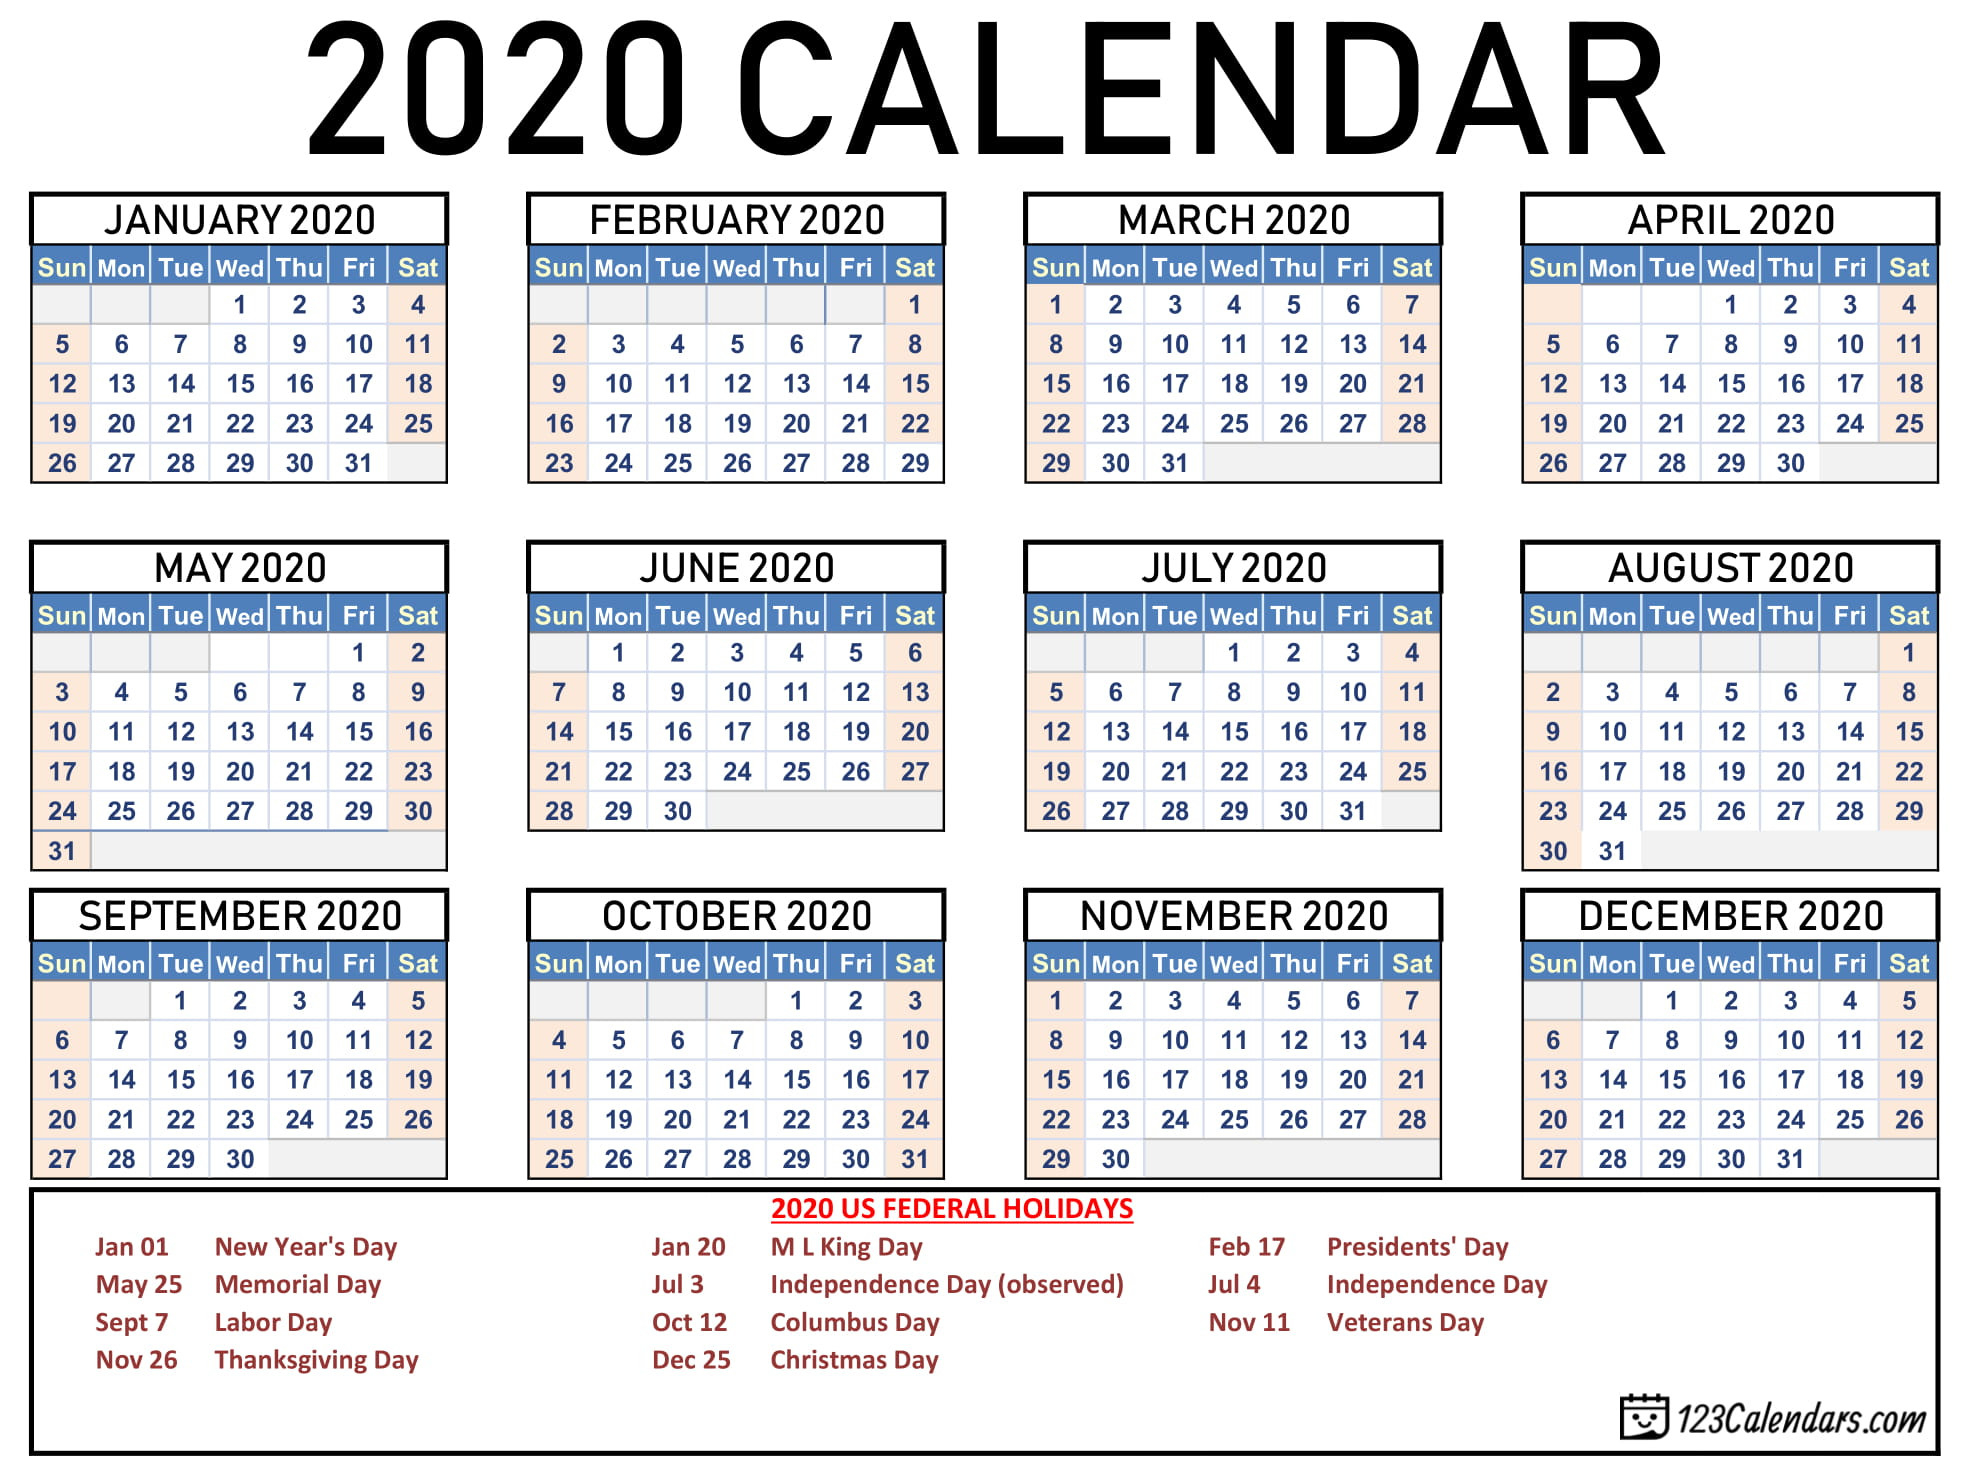 Free Printable 2020 Calendar   123Calendars  Large Printable Calendar